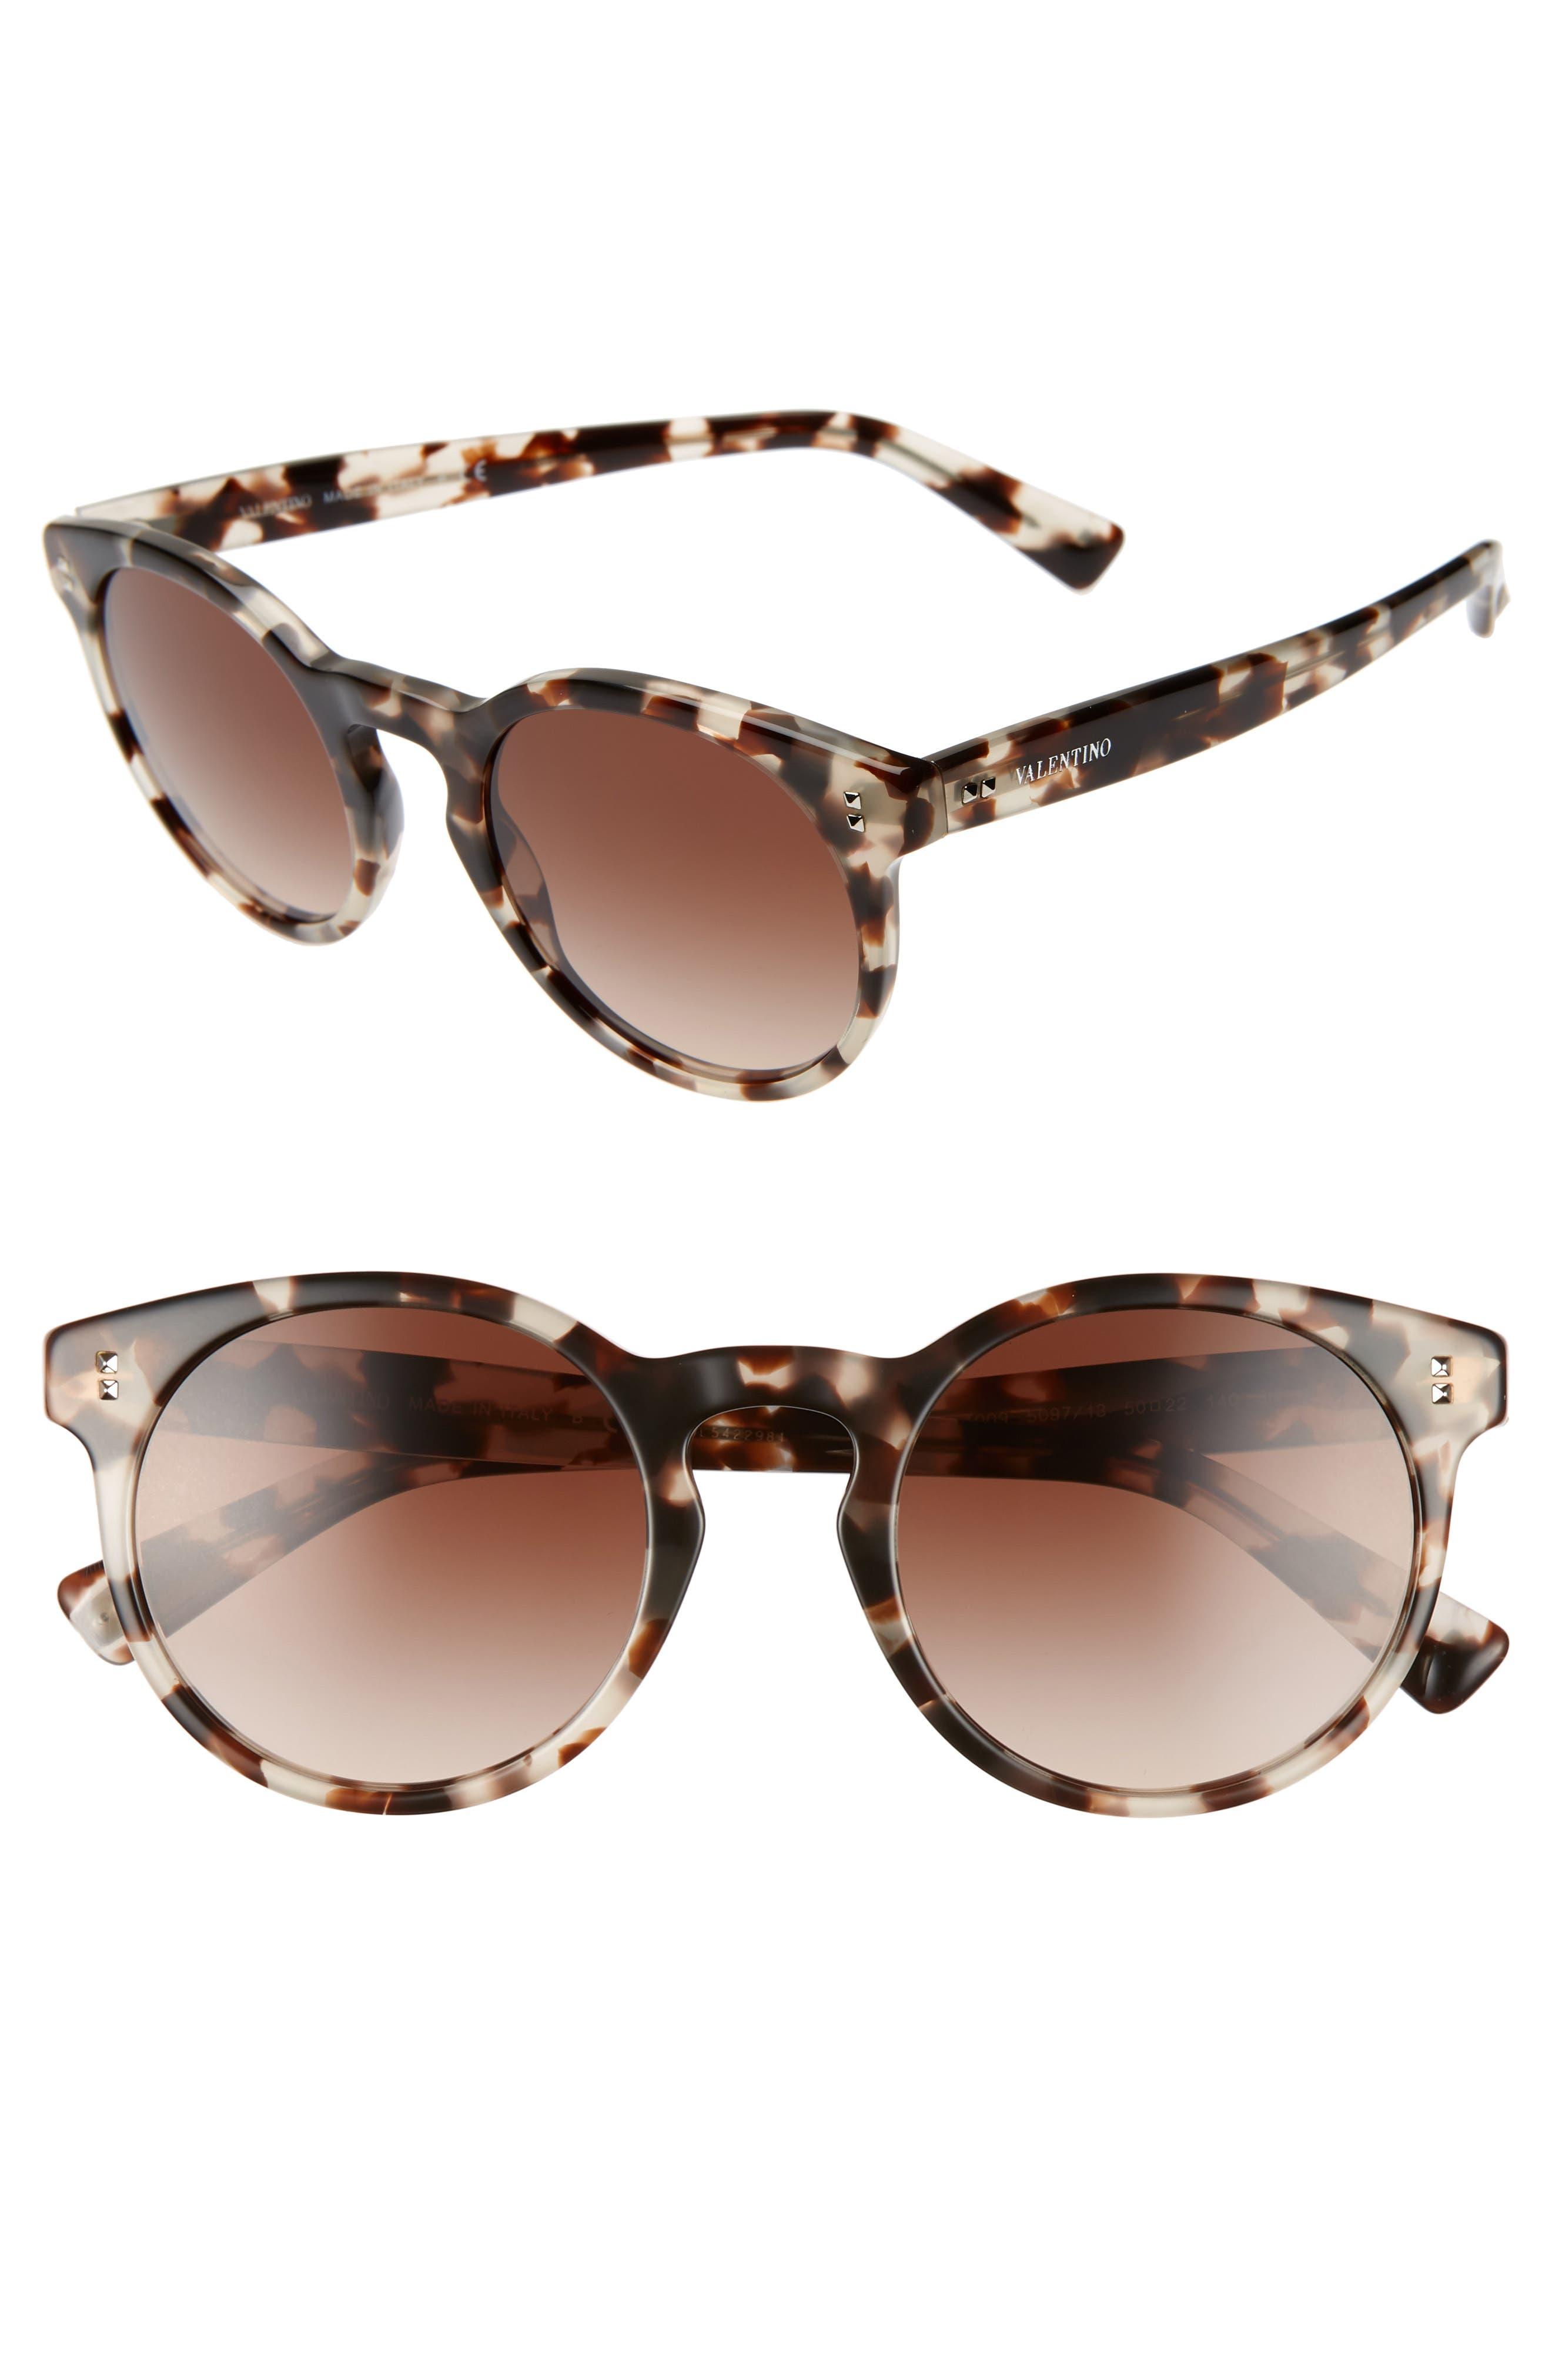 50mm Retro Sunglasses, Main, color, BEIGE TORTOISE/ BROWN GRADIENT